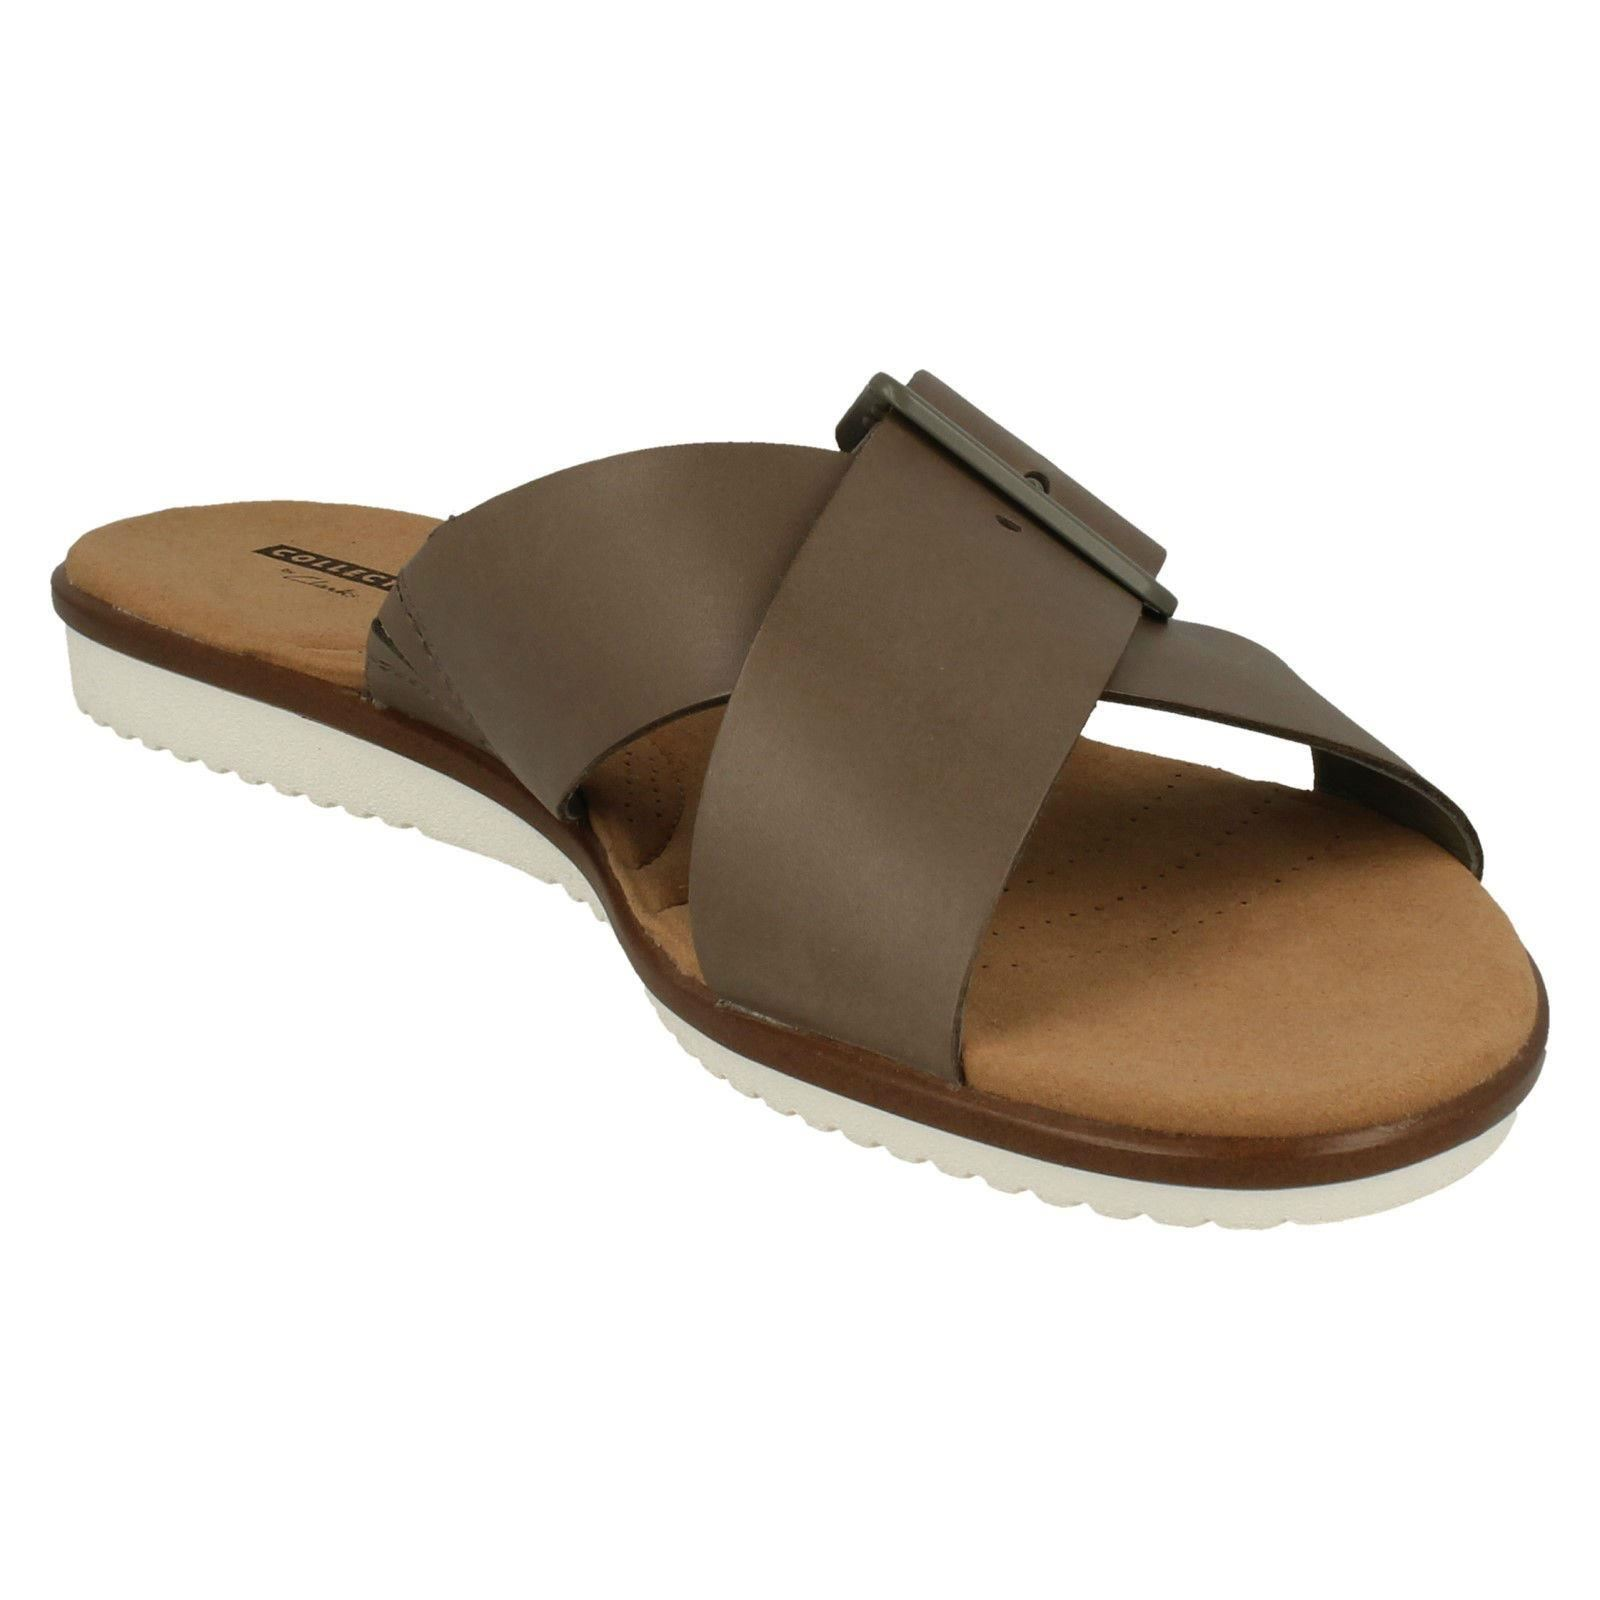 5a3f4c0d9ec Ladies Clarks Slip on Sandals Kele Heather UK 4.5 Sage (beige) D